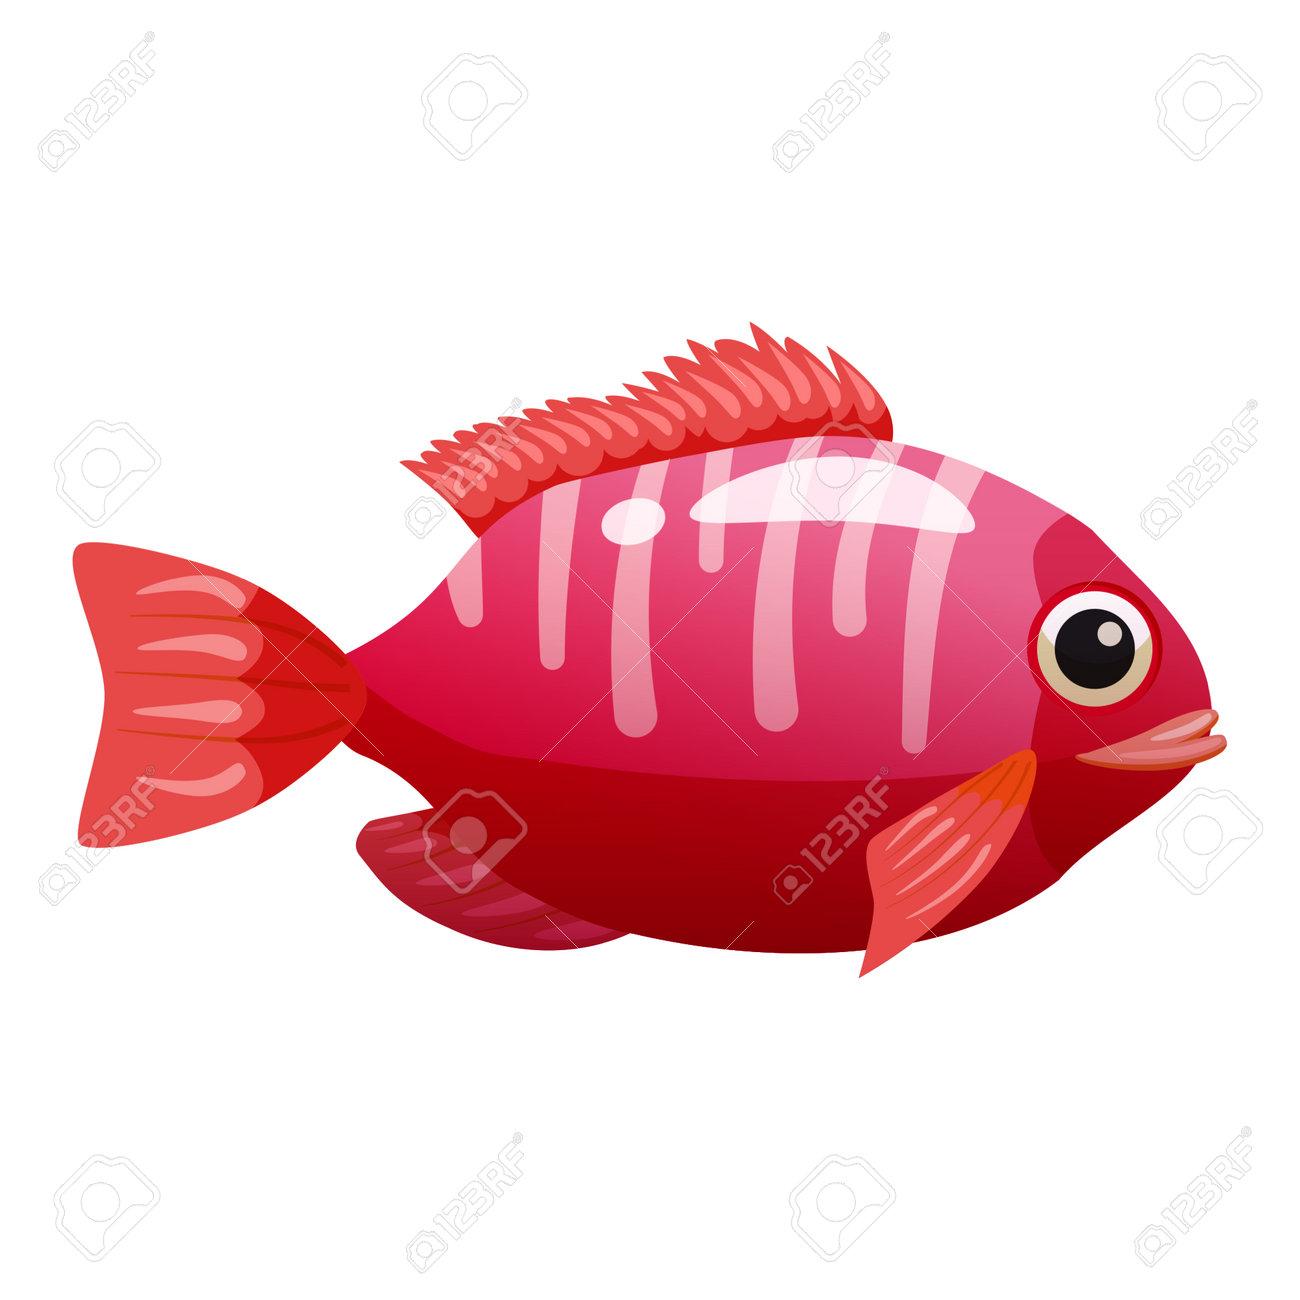 Tropical red fish, coral reef exotic pet animal. Aquarium sea life, vector illustartion cartoon style - 171709980